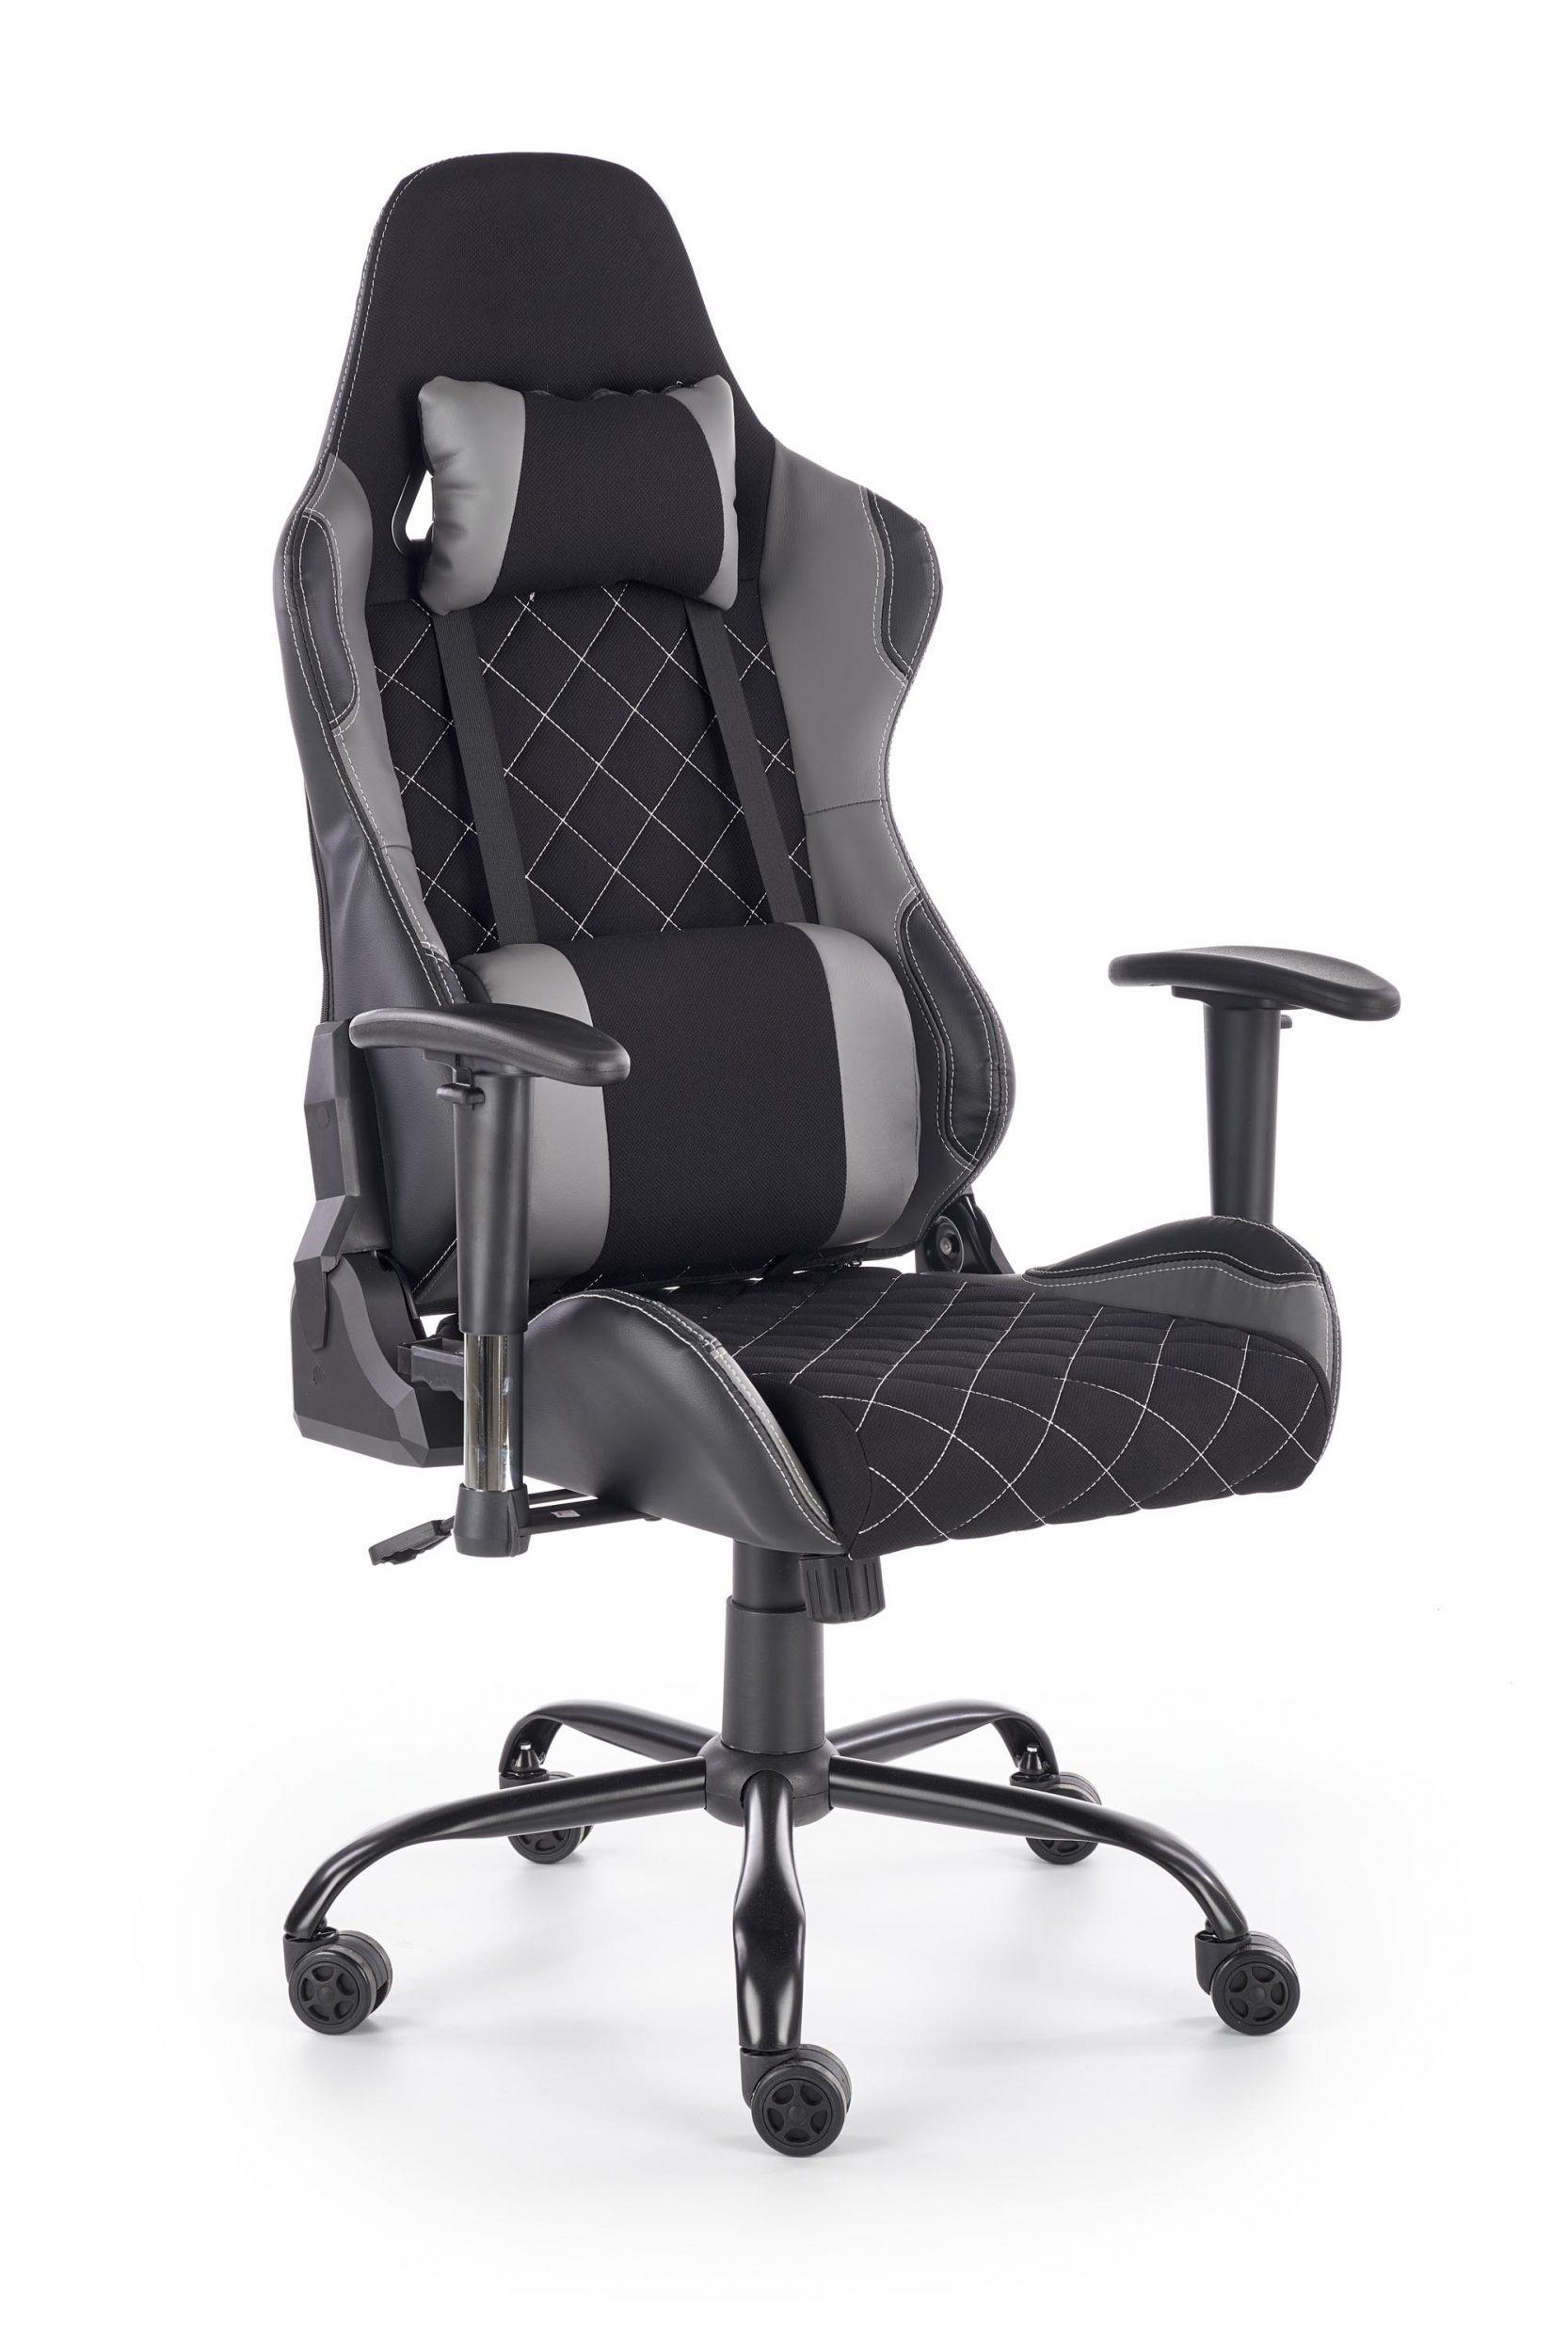 Scaun de birou ergonomic tapitat cu stofa si piele ecologica Drake Negru / Gri l69xA62xH127-134 cm